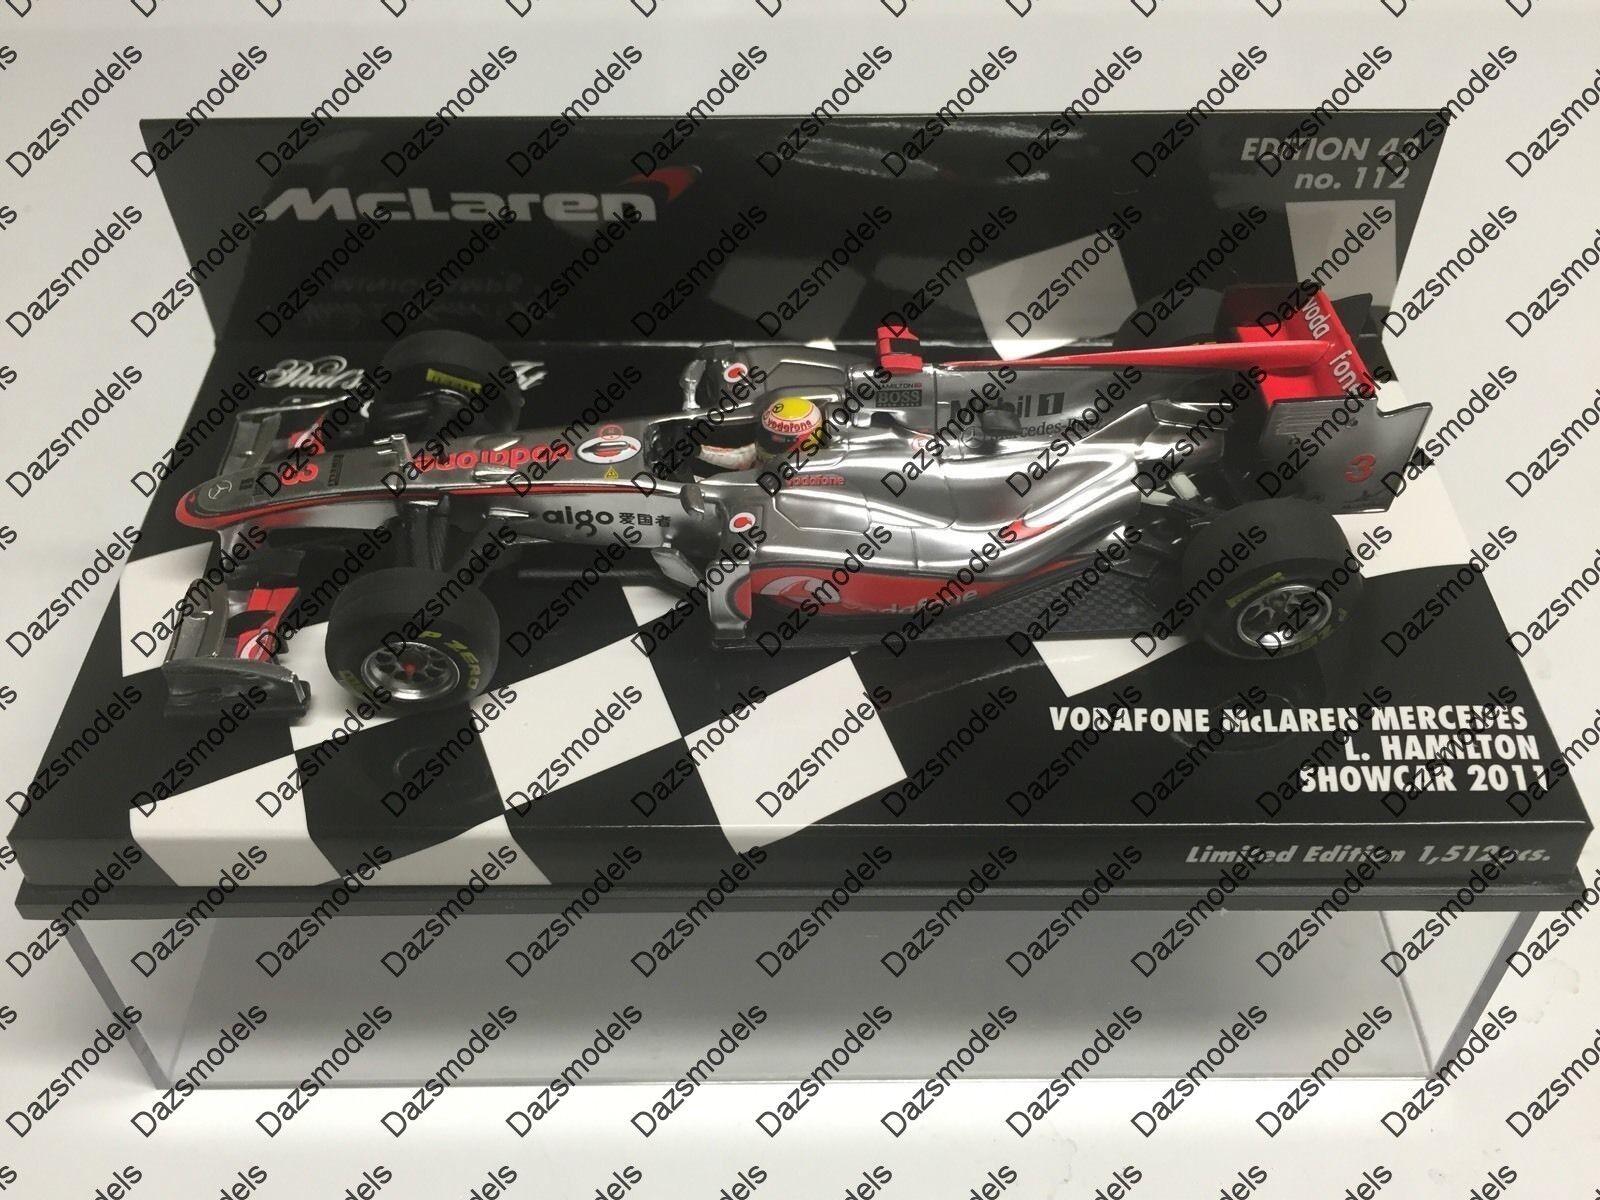 Minichamps F1 Vodaphone Mclaren Mercedes Showcar 2011 L. Hamilton